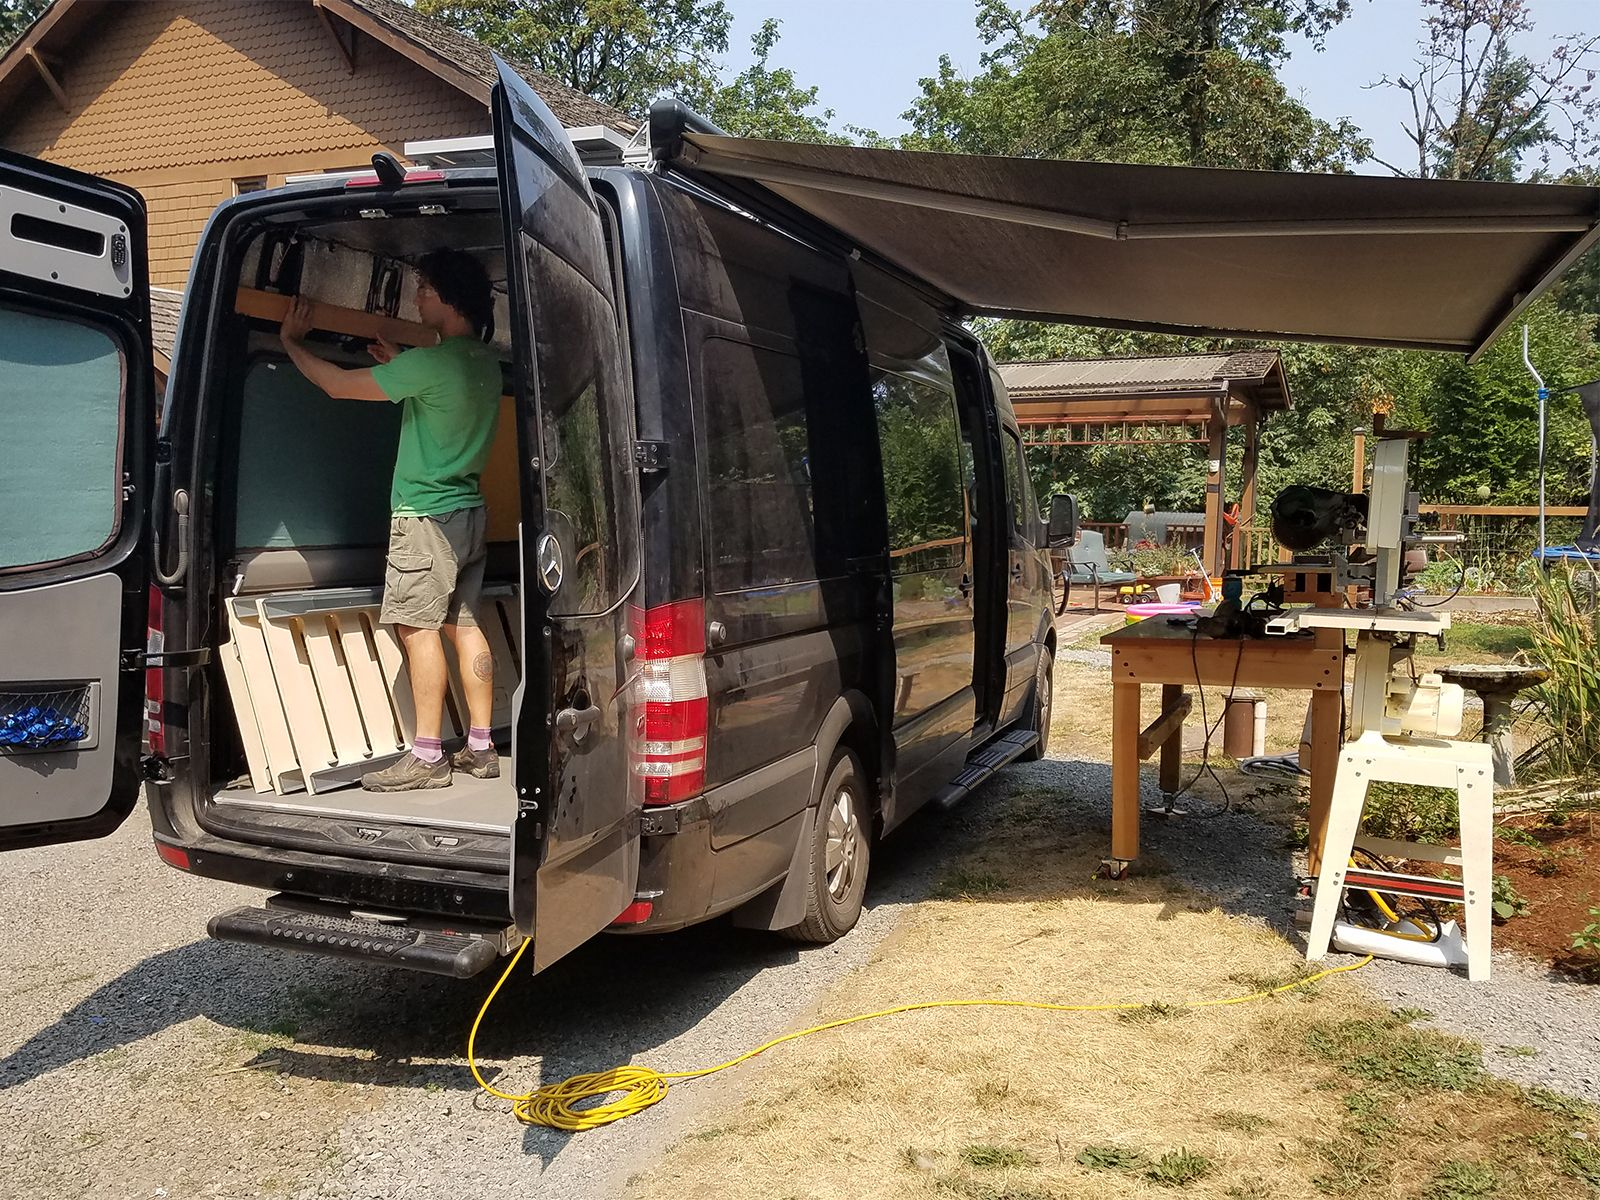 Custom Sprinter Conversion Maximize The Exterior Creatid Sprinter Conversion Sprinter Sprinter Van